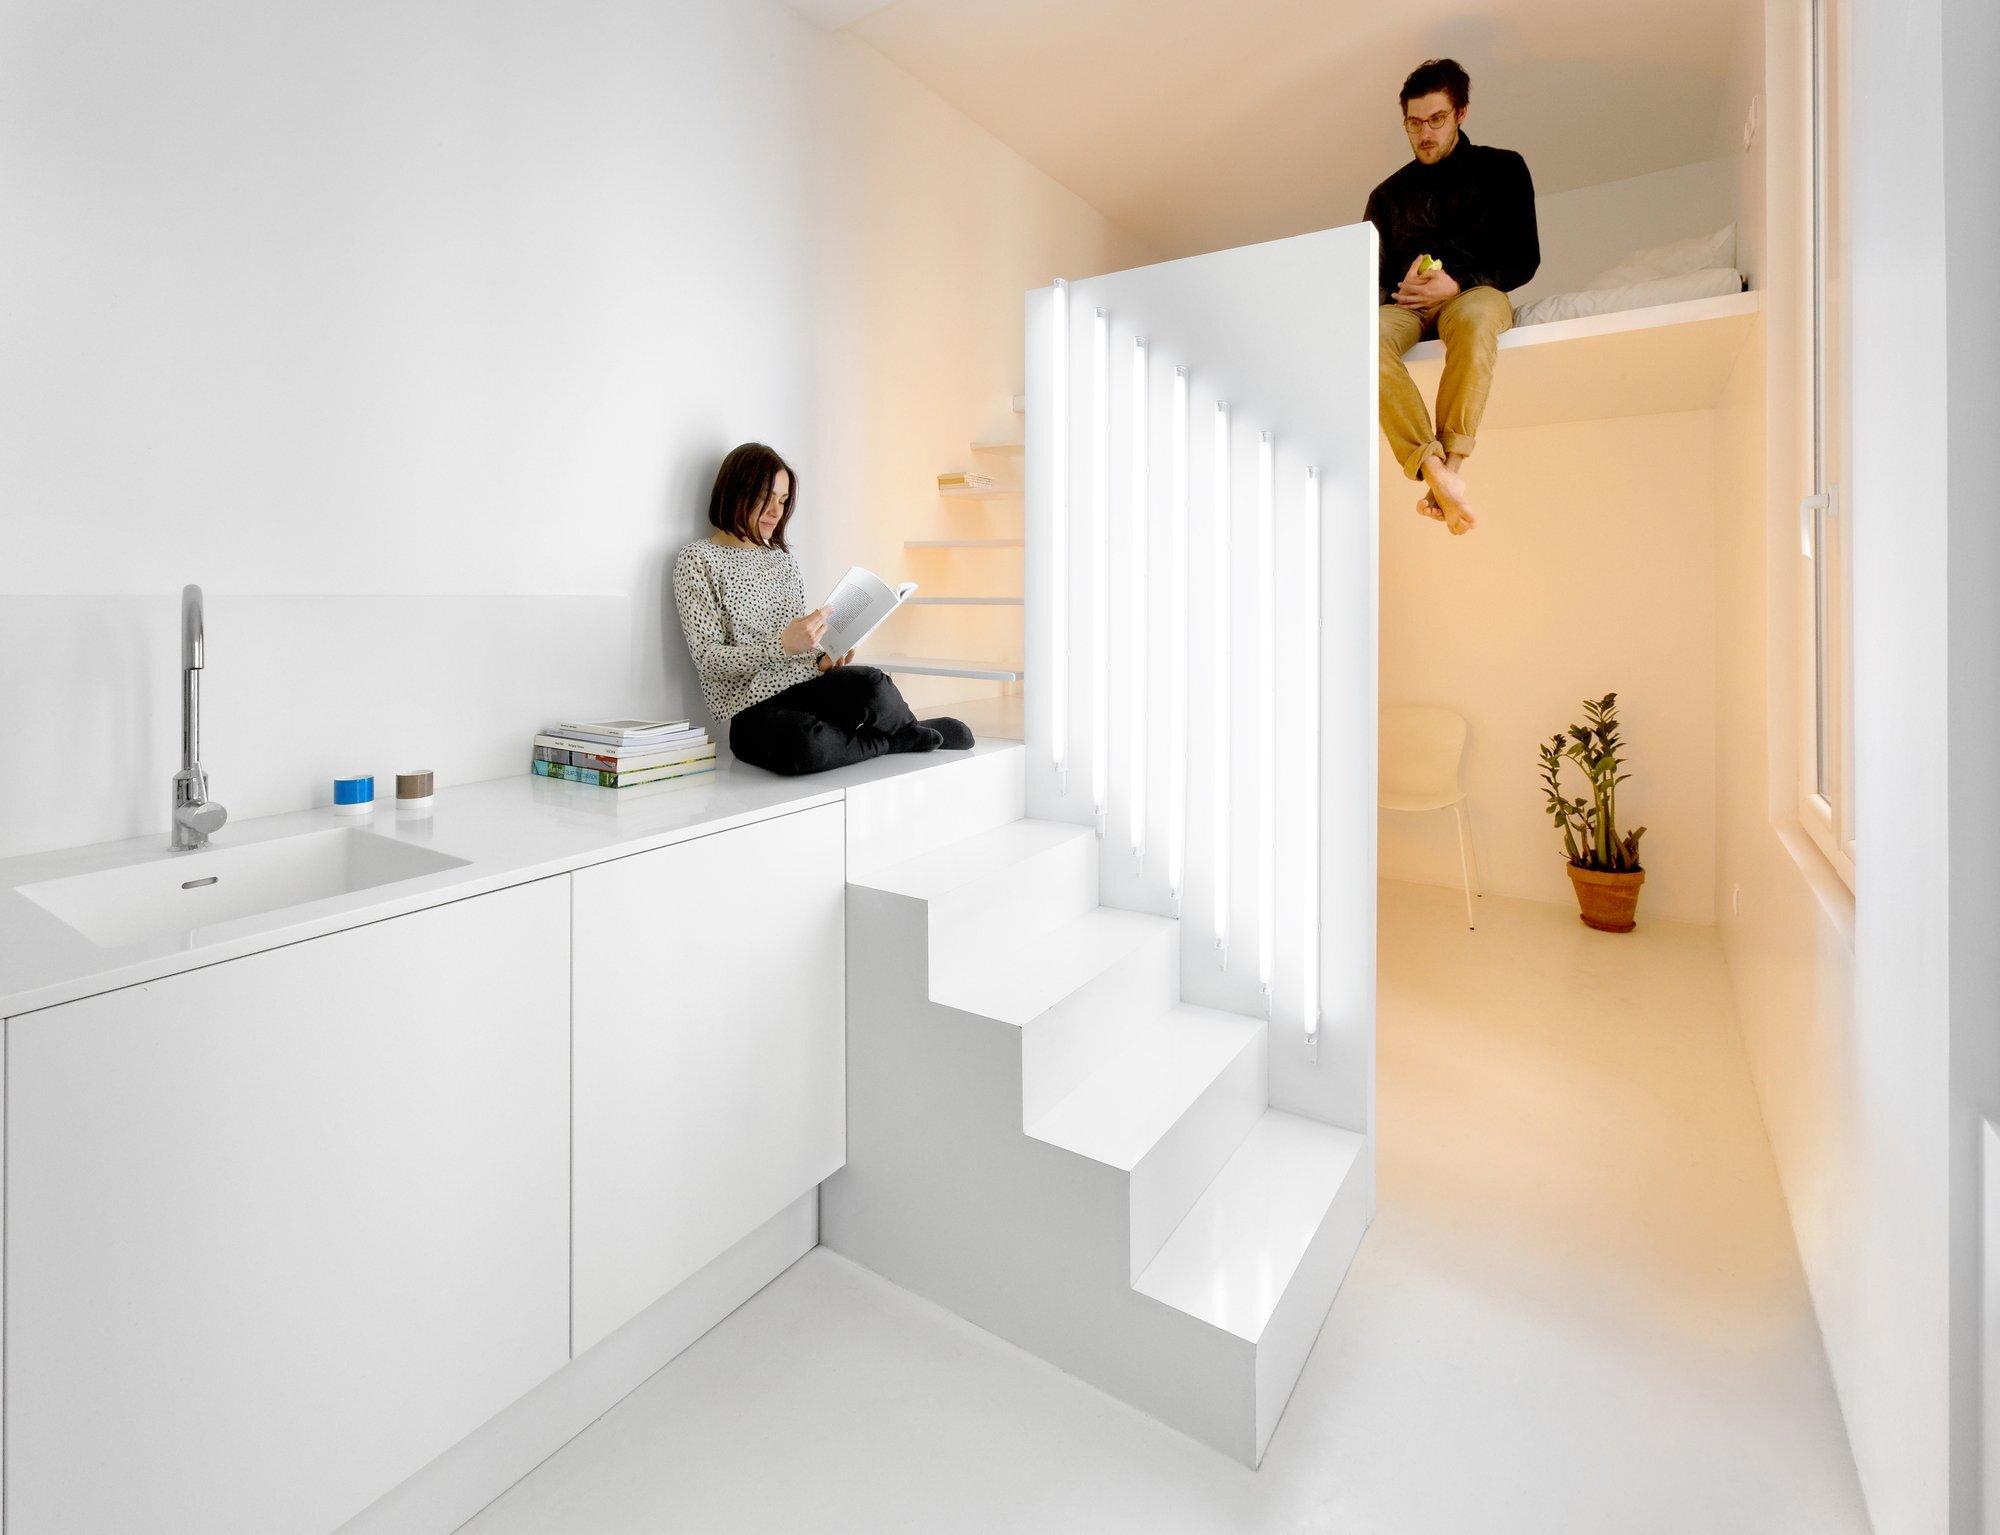 Appartement Spectral - BETILLON DORVAL‐BORY - Paris - France - Tiny Apartment - Loft - Humble Homes